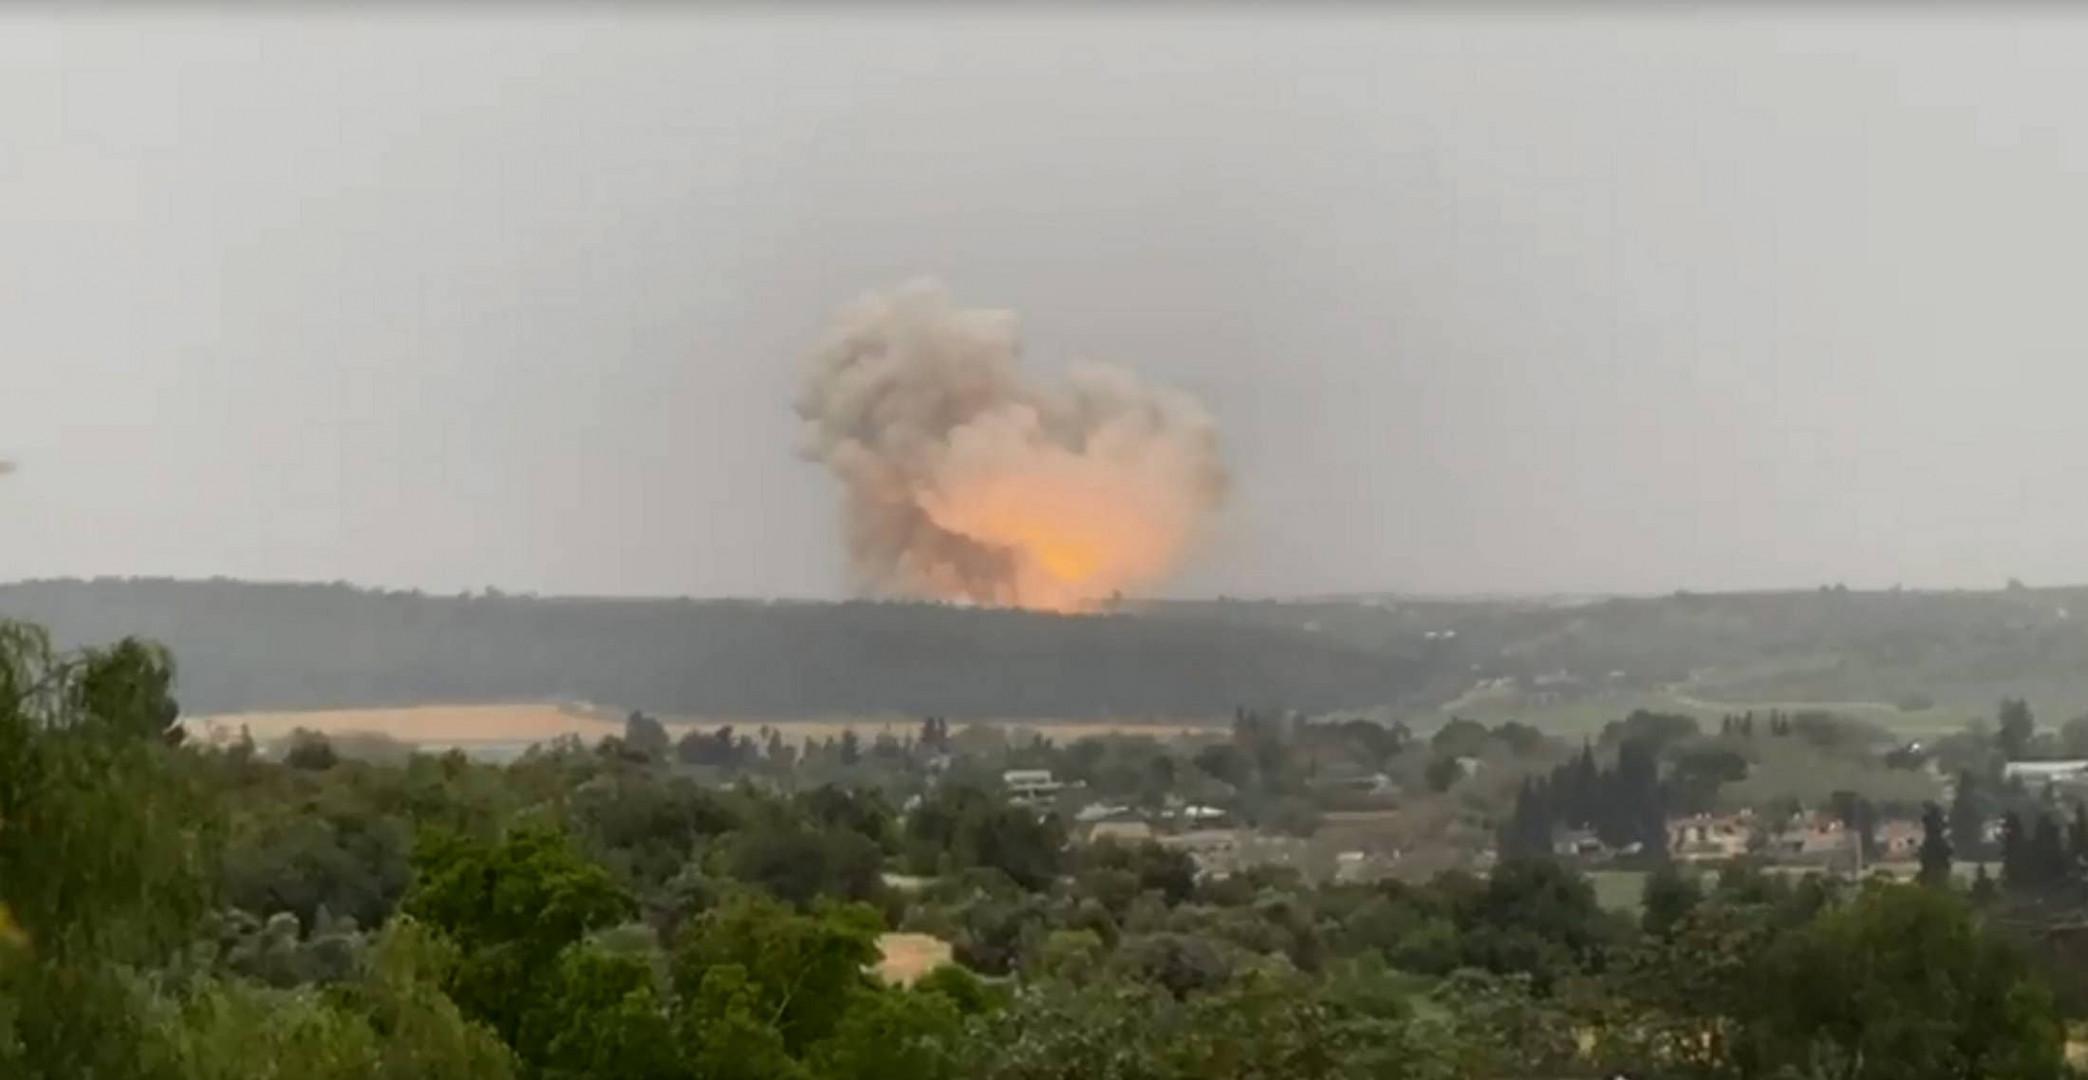 فيديو.. انفجار قوي يهز وسط إسرائيل